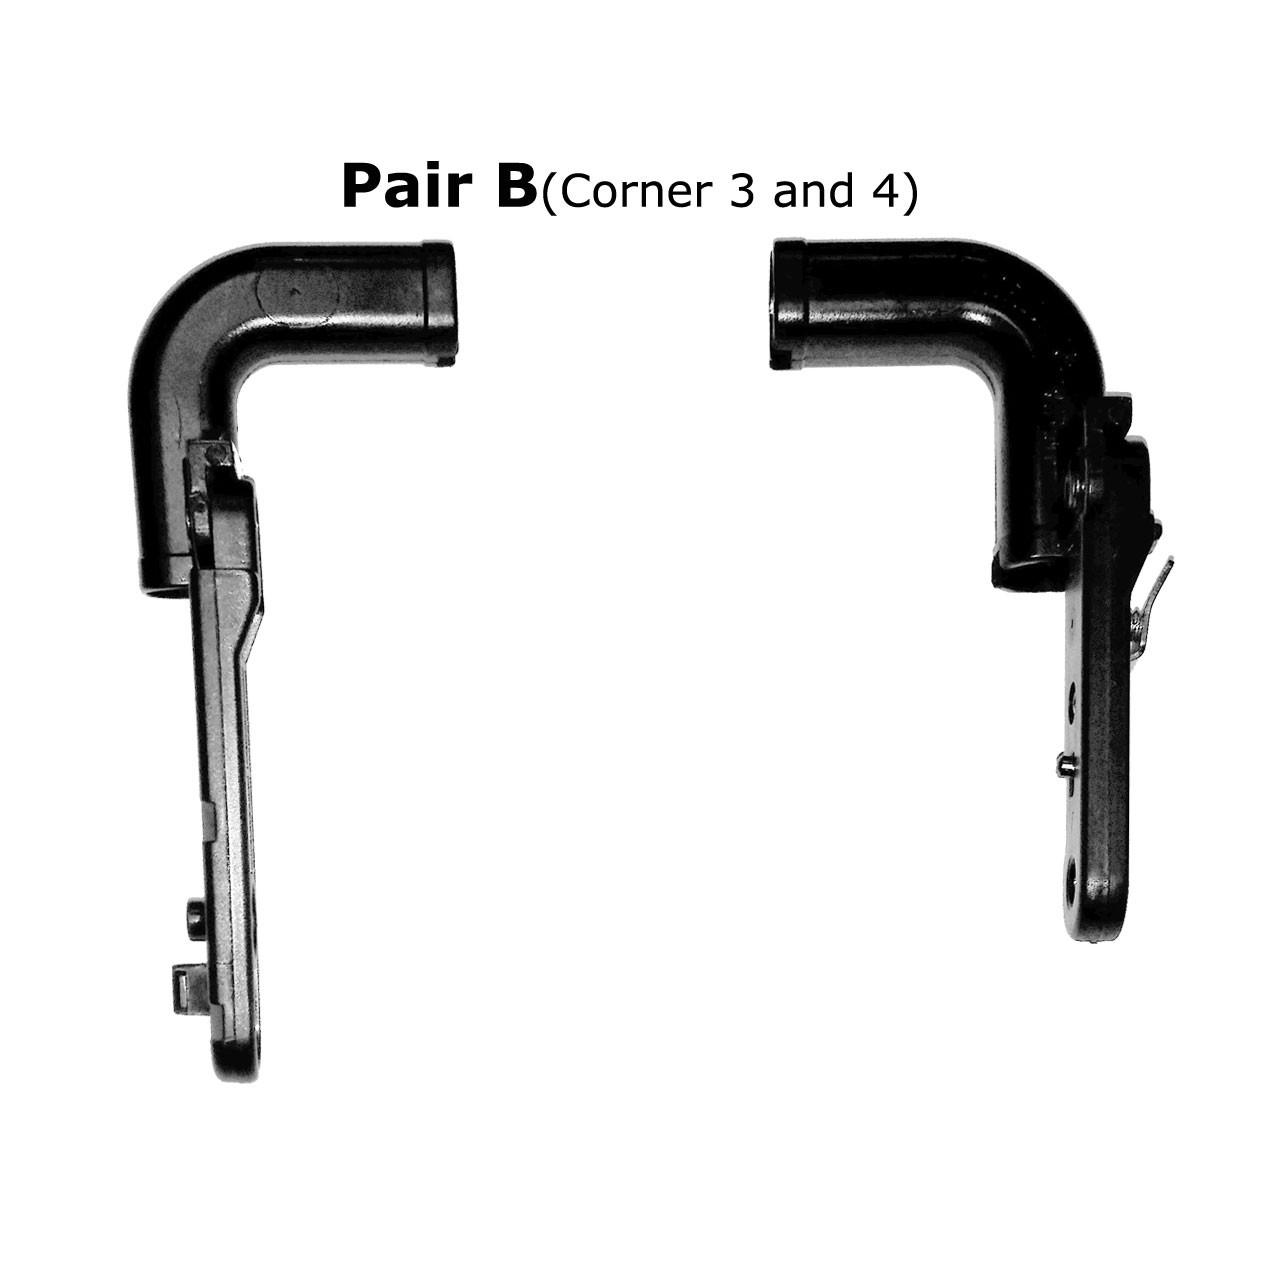 "10"" Width / Pair B (Corner 3 and 4)"